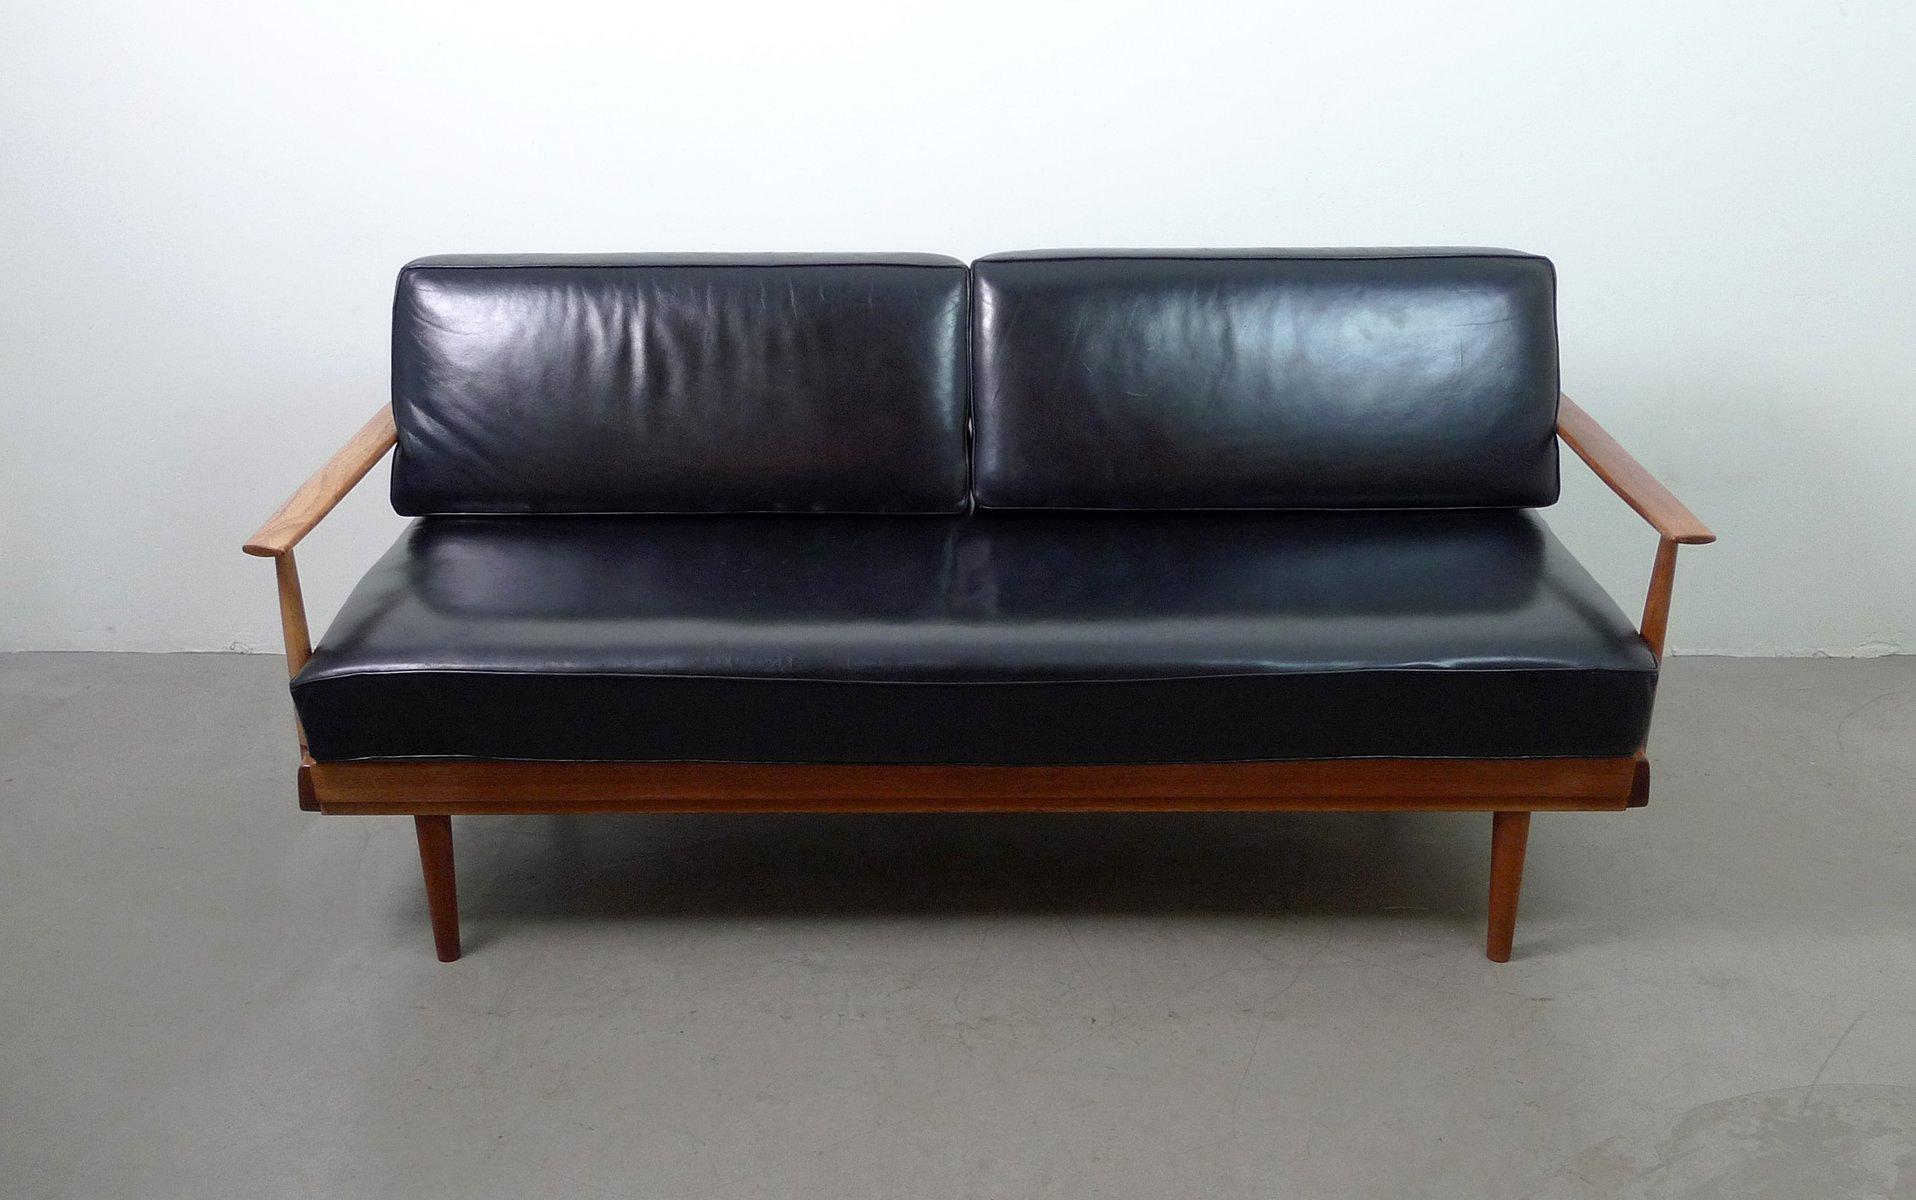 german sofa bed sona franz fertig modern futons miami by the collection german furniture. Black Bedroom Furniture Sets. Home Design Ideas